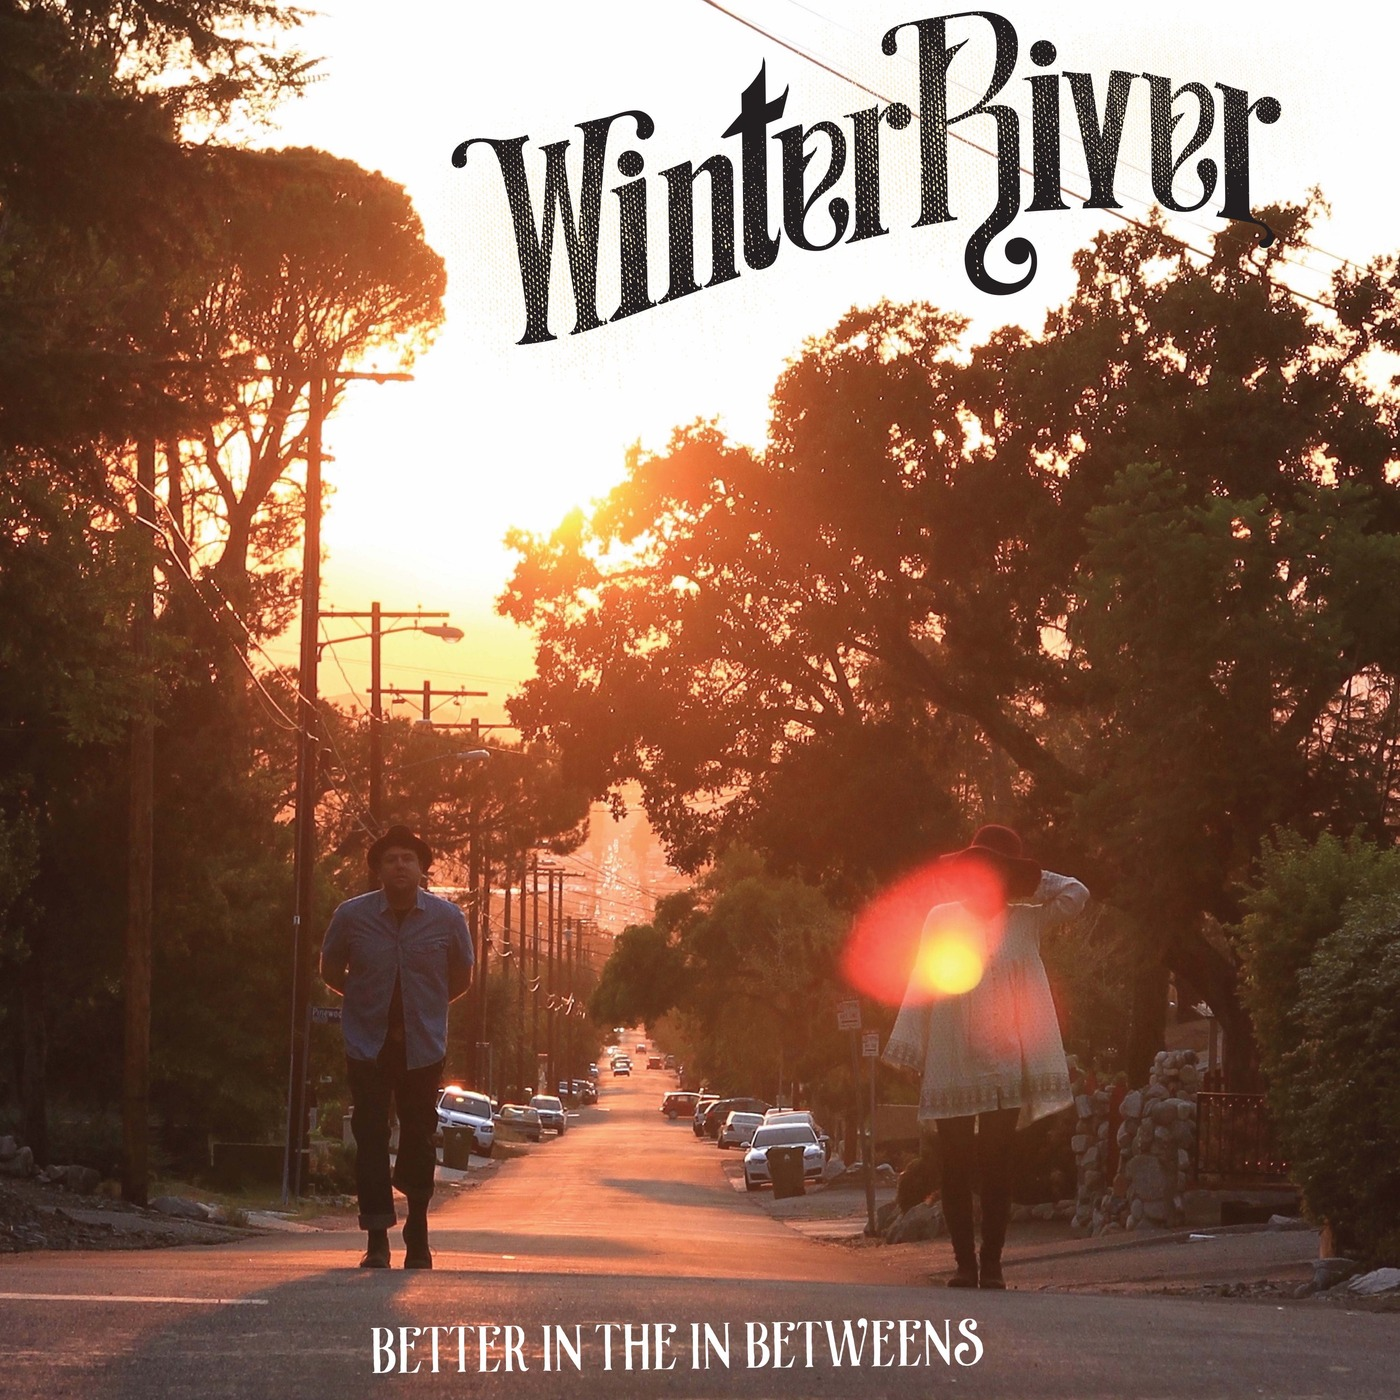 Winter RiverLullabySimilar Artists